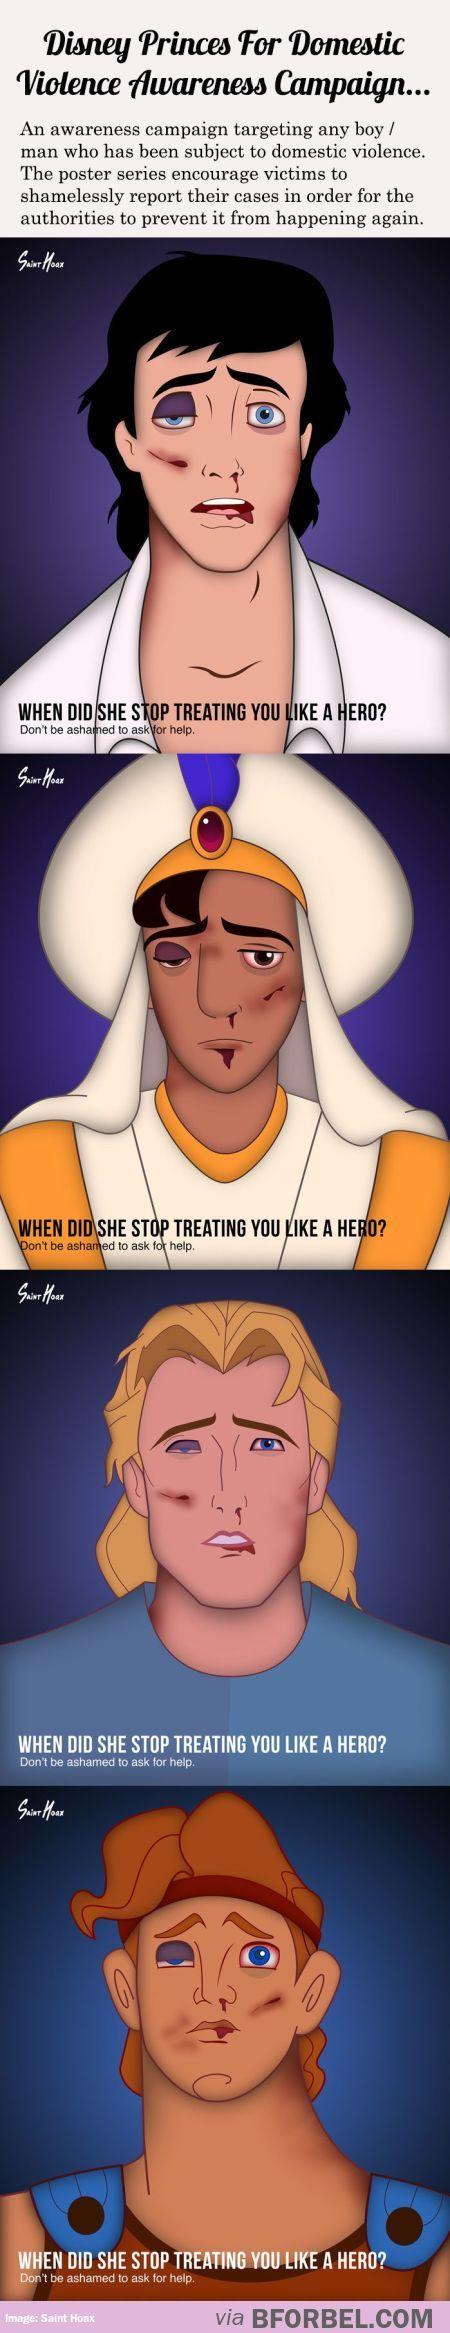 Disney Princes Raise Awareness For Domestic Violence Against Men…